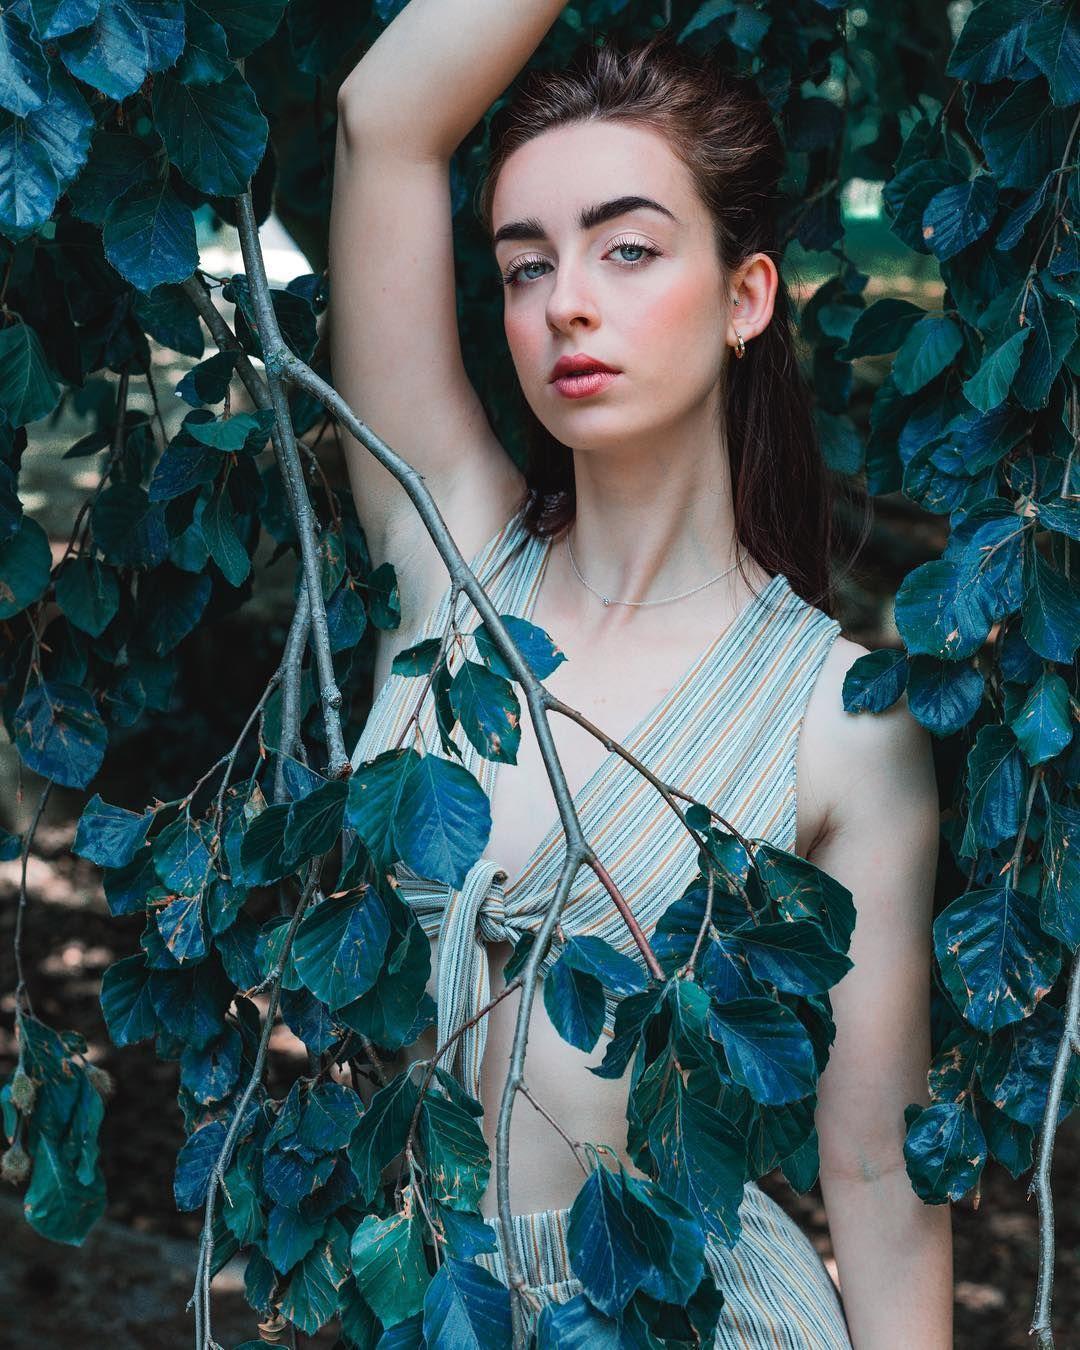 Sophie Rodrigues De Leon On Instagram Flobayphoto